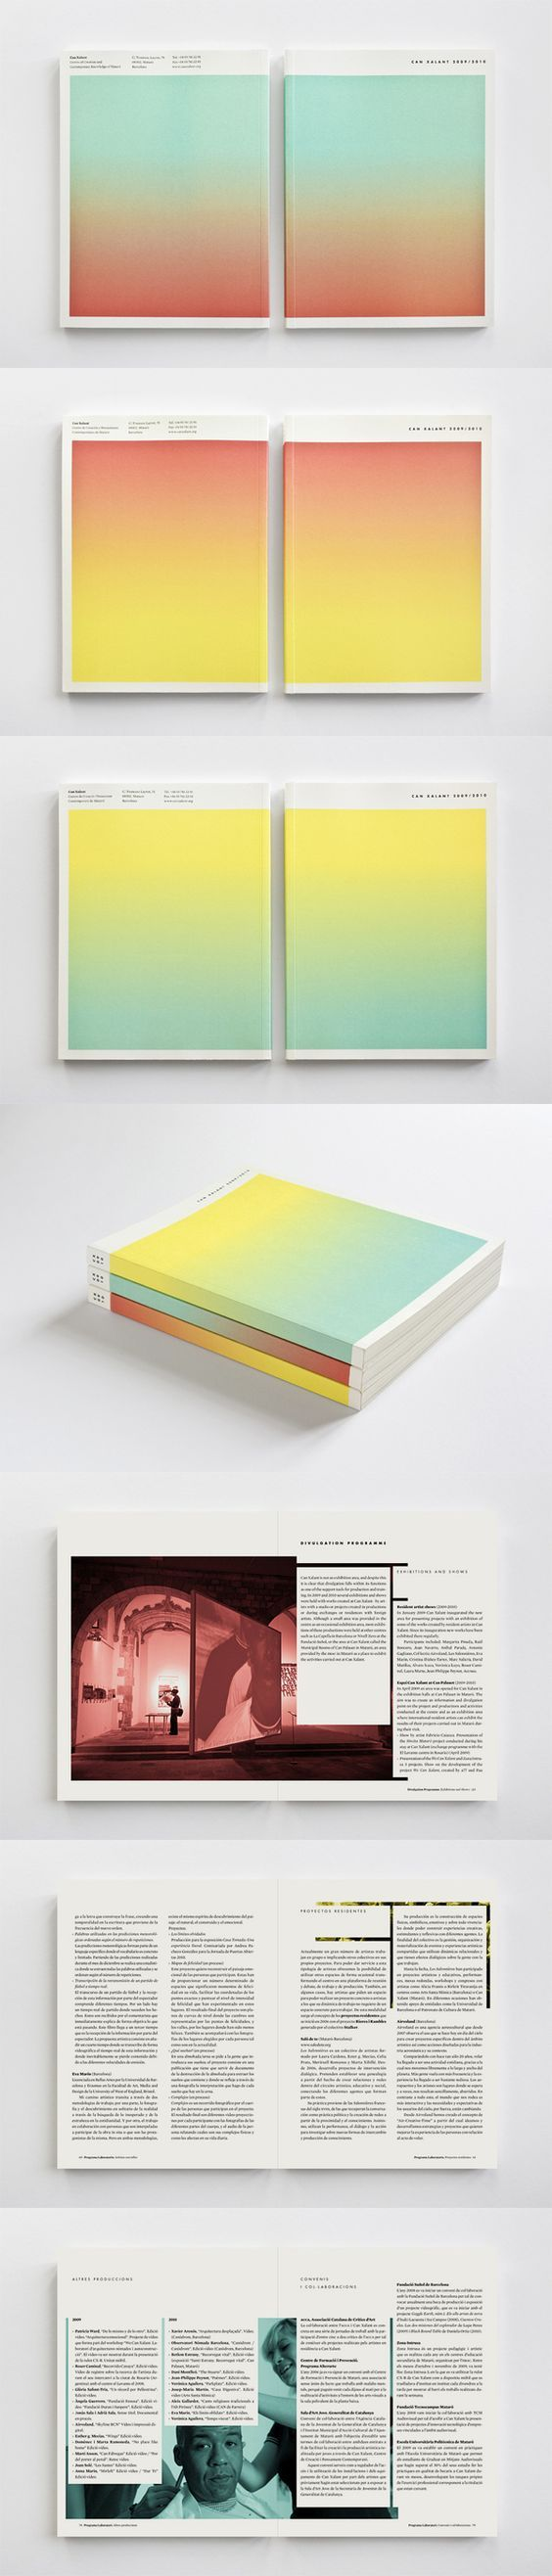 GR 650 - OL1: MS: Design Seminar/Portfolio